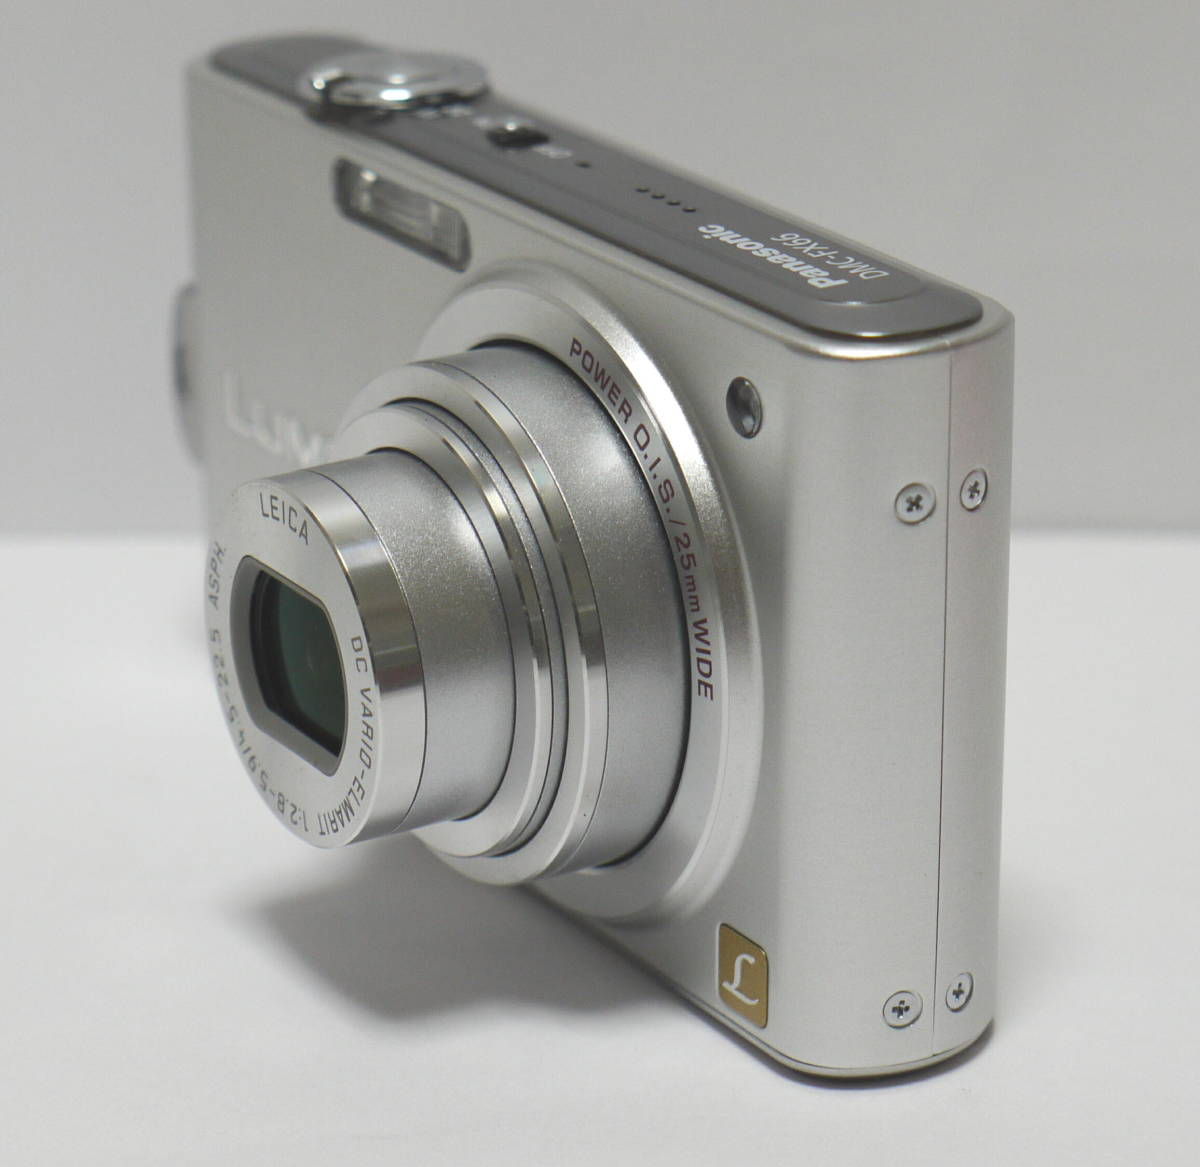 PANASONIC パナソニック デジタルカメラ 1410万画素 LUMIX  DMC-FX66 動作・美品 バッテリー DMW-BCF10付_画像5